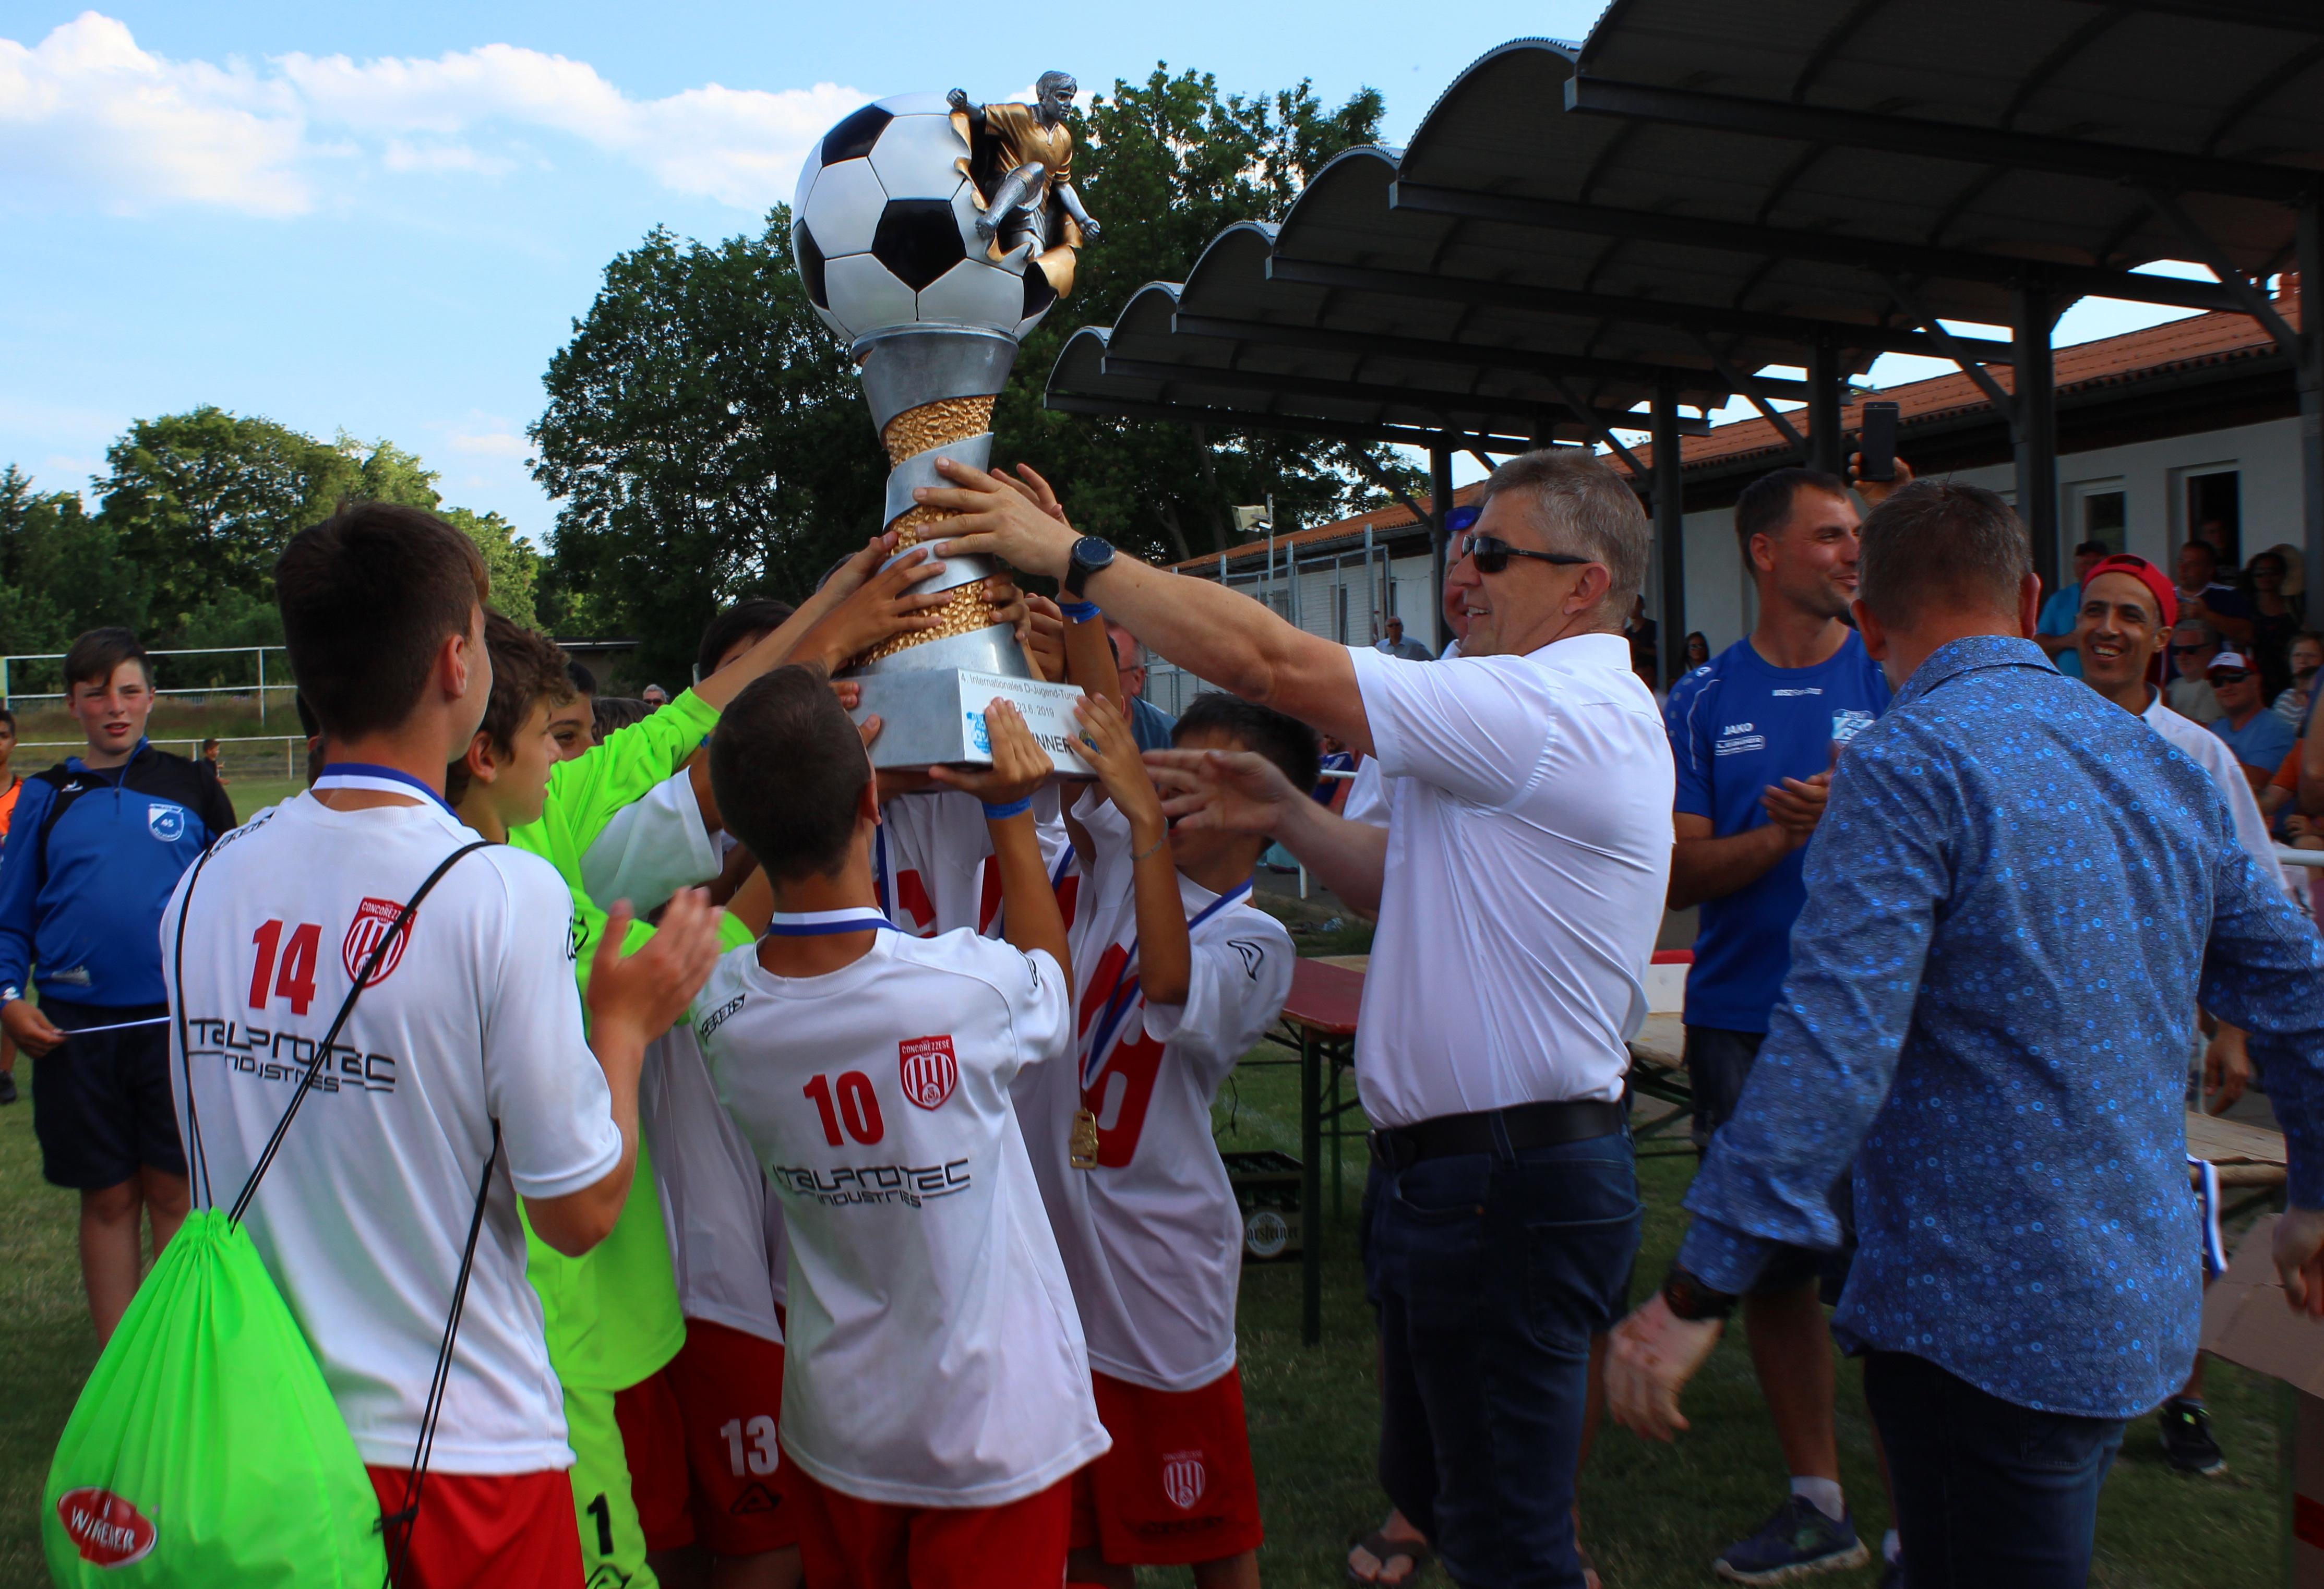 Siegerpokal im Jugendfußballturnier geht nach Italien